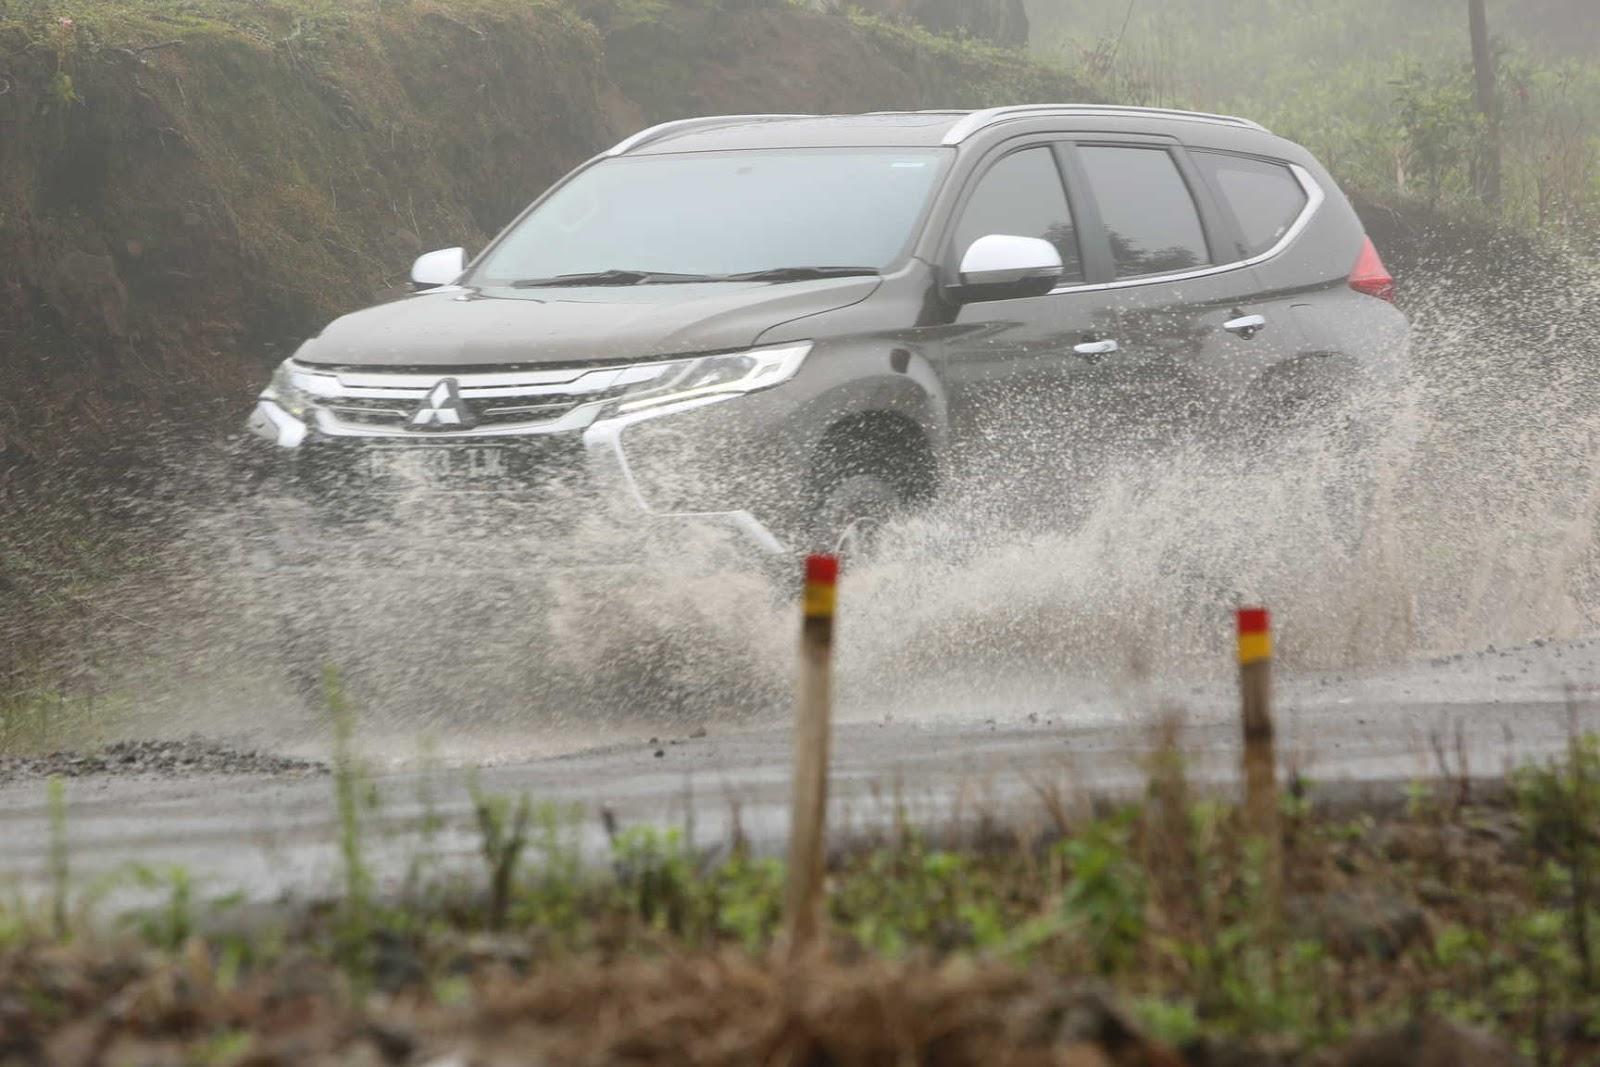 mitsubishi pajero sport melibas hujan